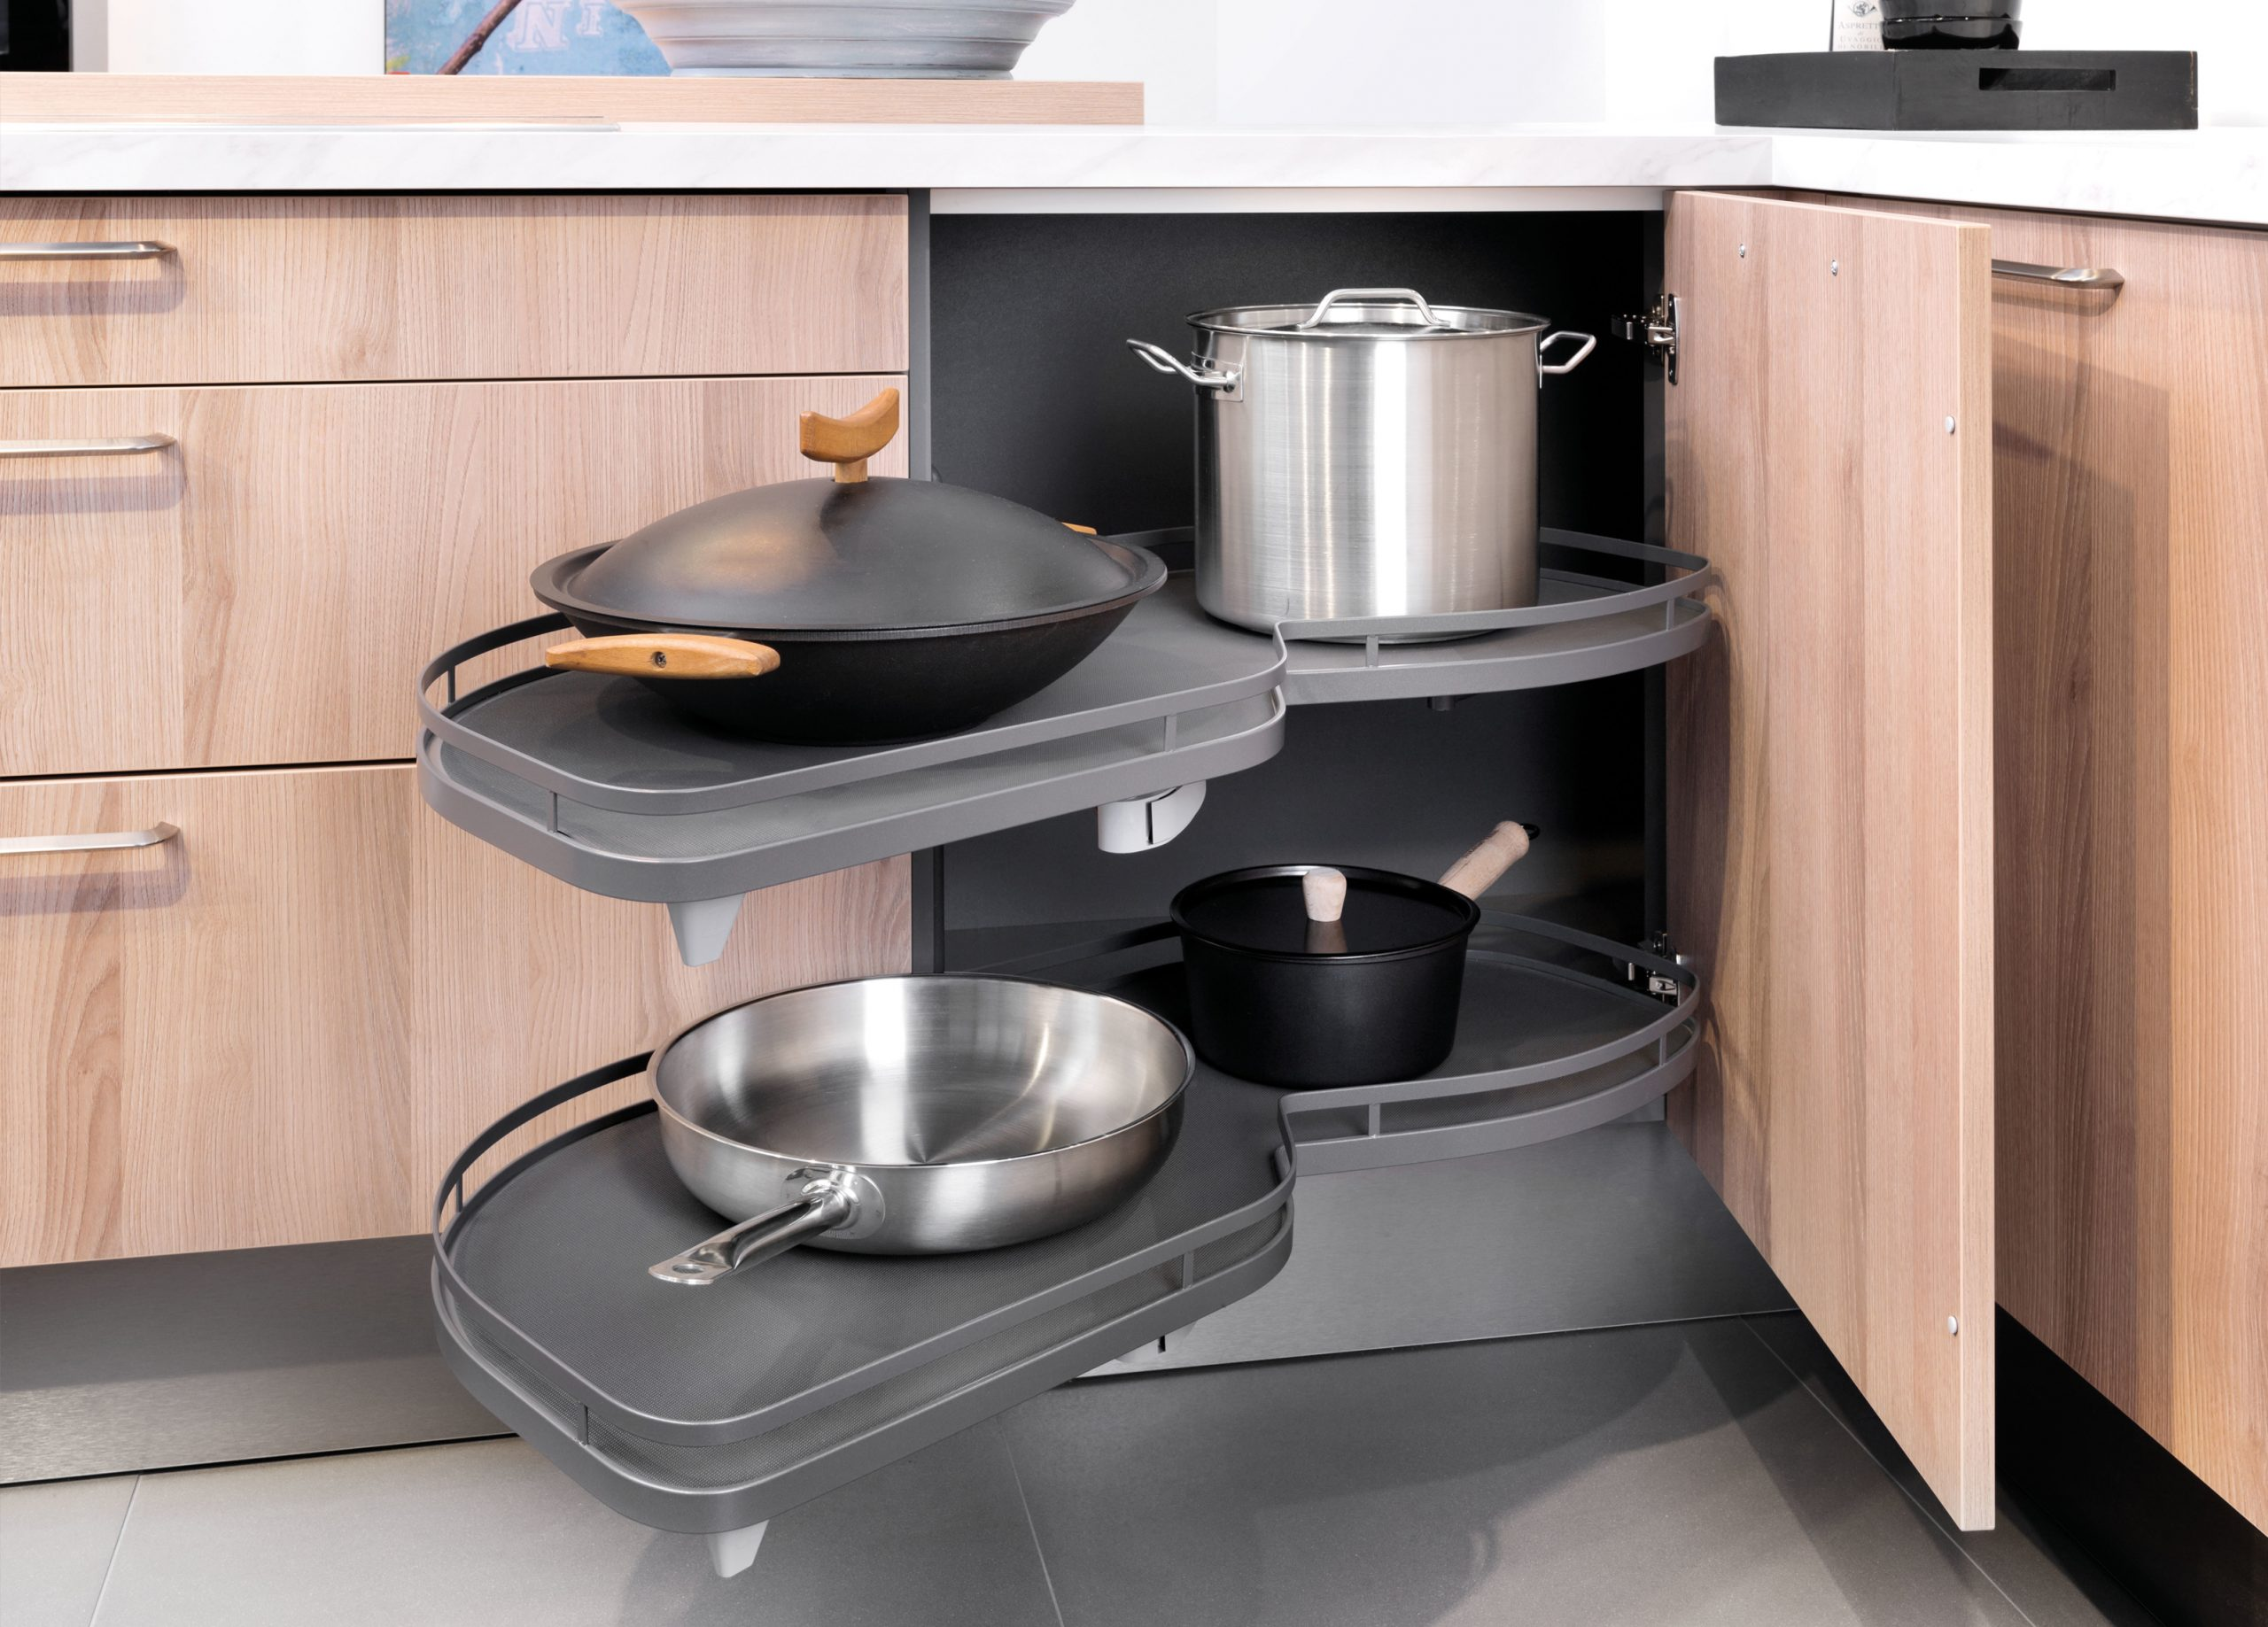 Full Size of Ikea Hacks Küche Aufbewahrung Küche Aufbewahrung Wand Küche Aufbewahrung Schrank Küche Aufbewahrung Edelstahl Küche Küche Aufbewahrung